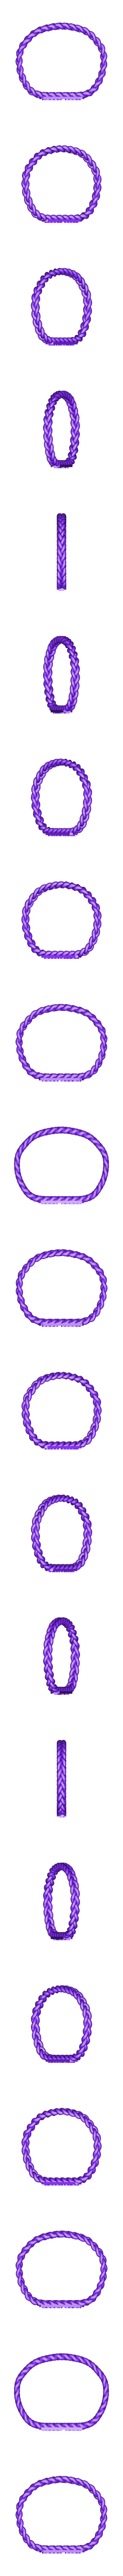 CUSTOM Braided bracelet.stl Download STL file Jewelry Pack - Bracelet Wristband Pendant Military Dog Tag Heart • 3D printer model, Custom3DPrinting